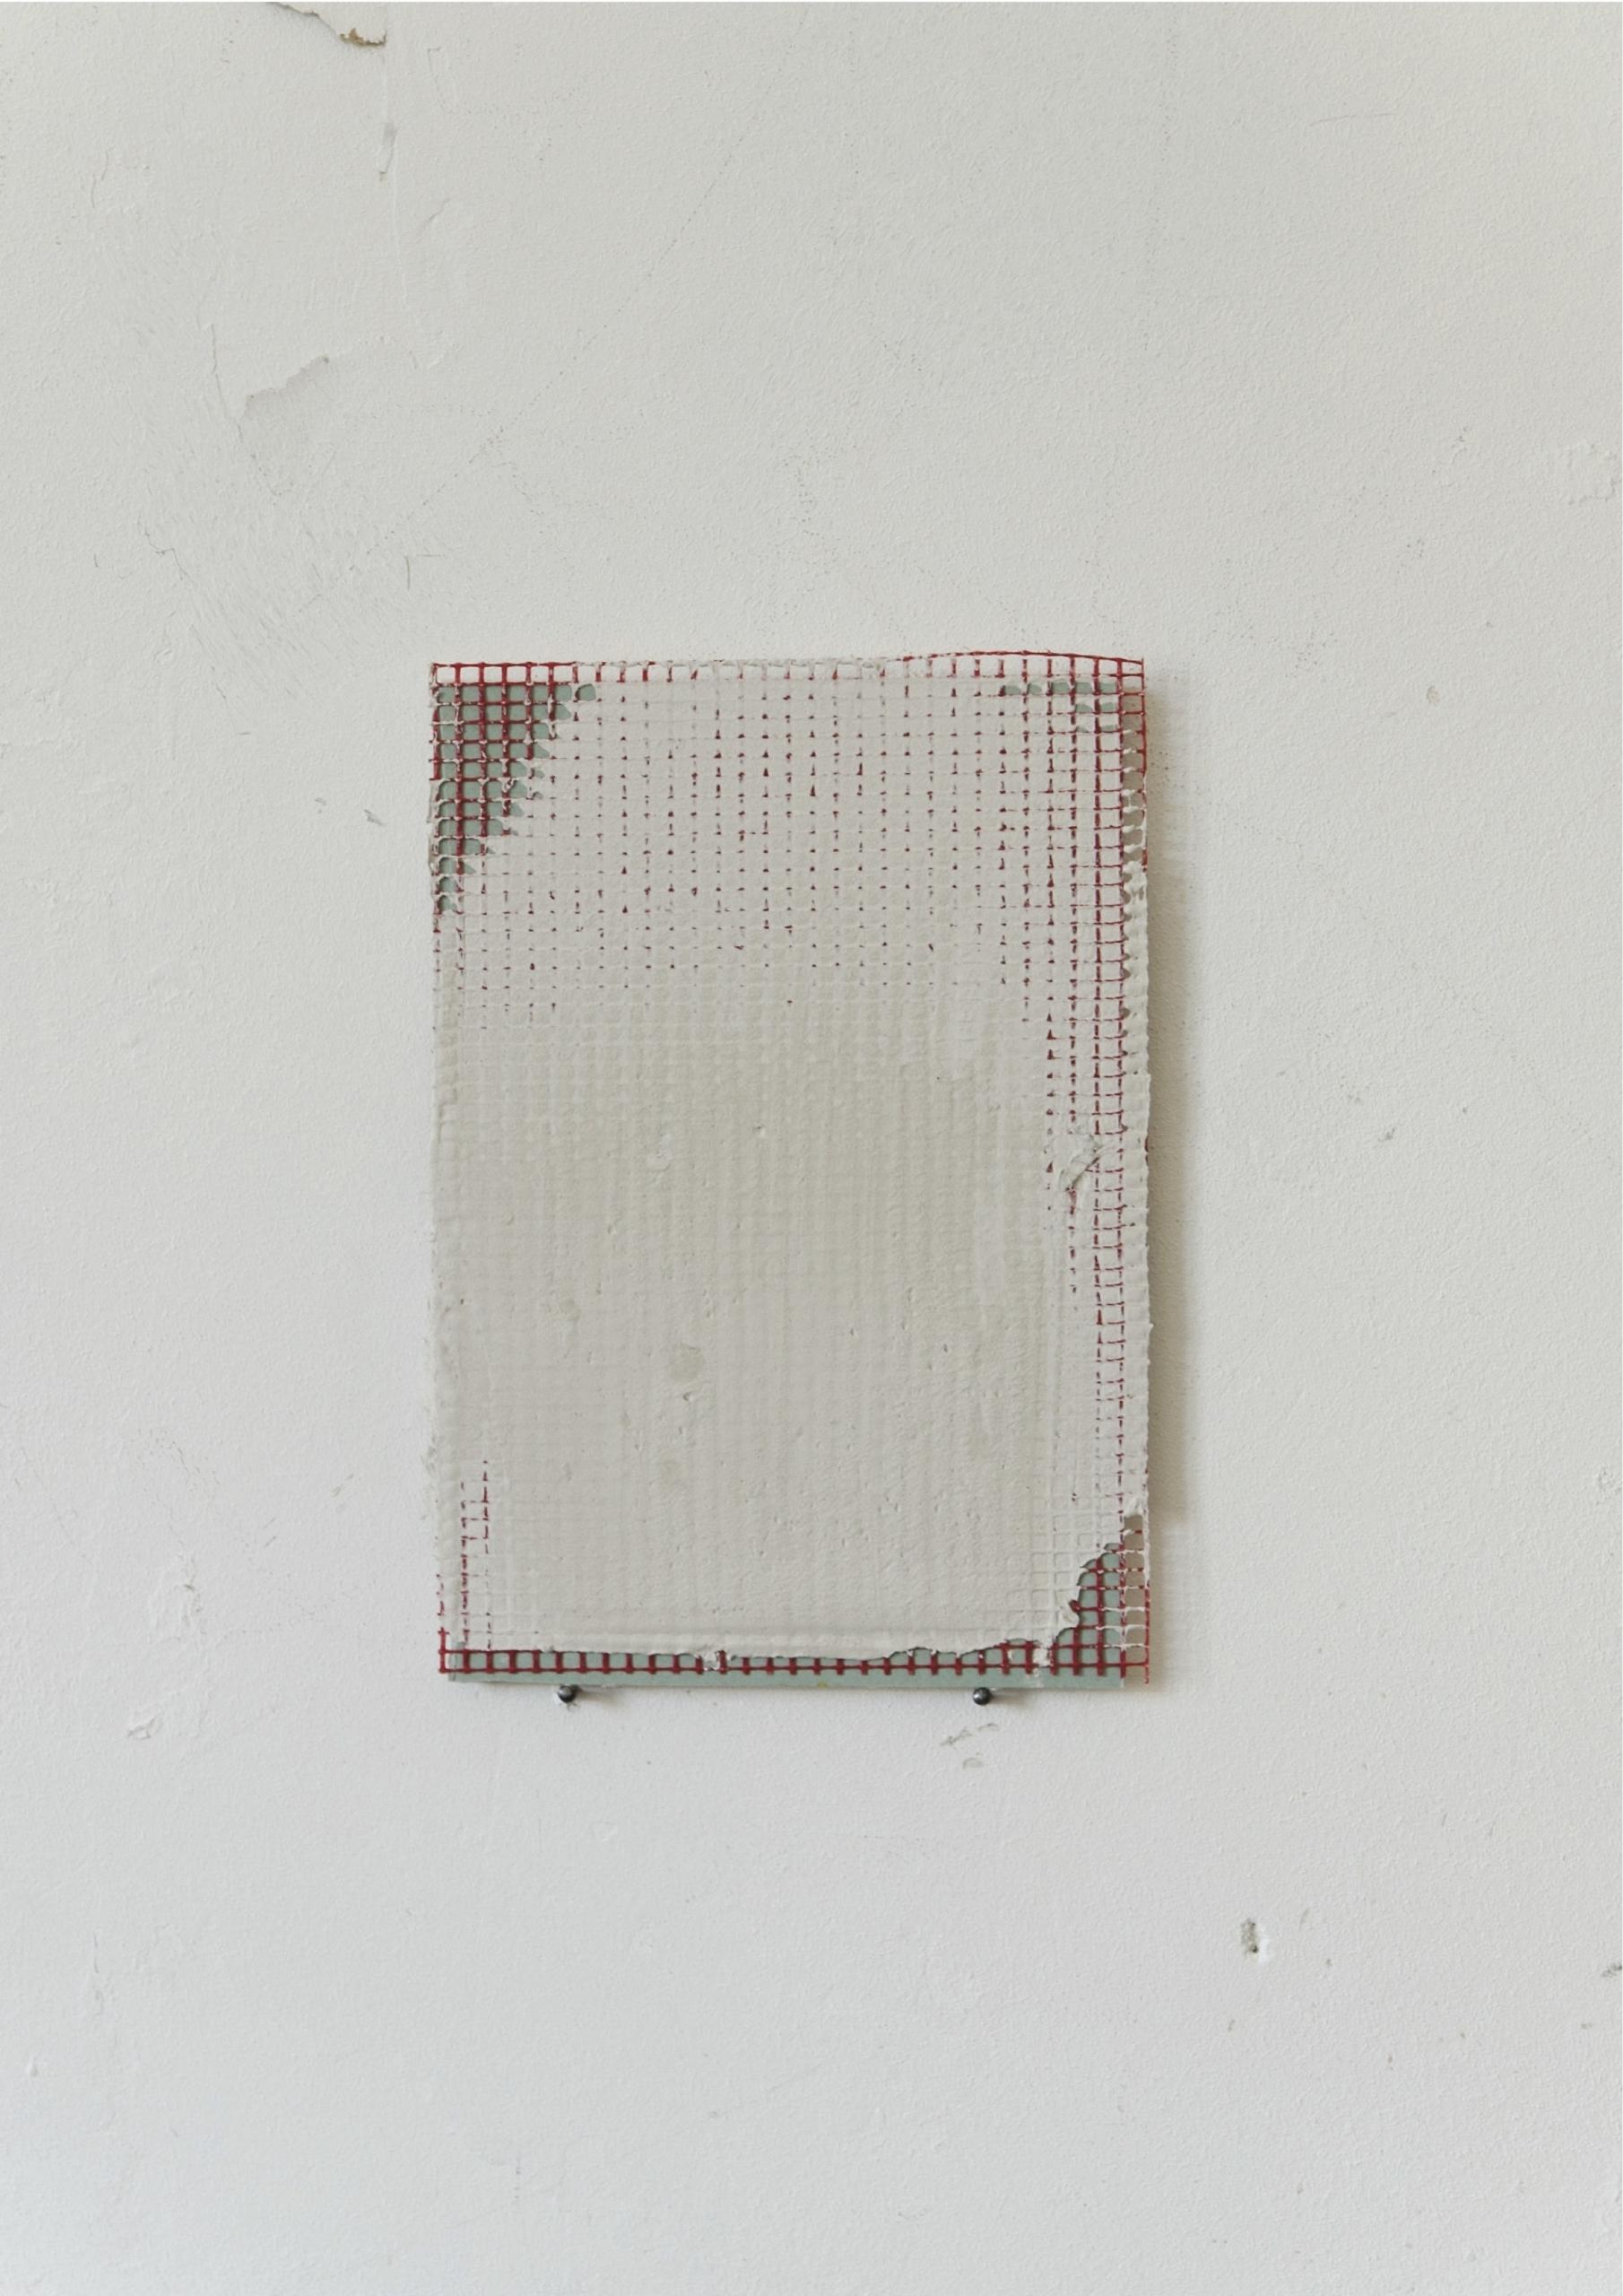 Kriz Olbricht, painting, 2015. Plasterboard, reinforcement fabric, adhesive plaster. 14.5 x 21 cm.